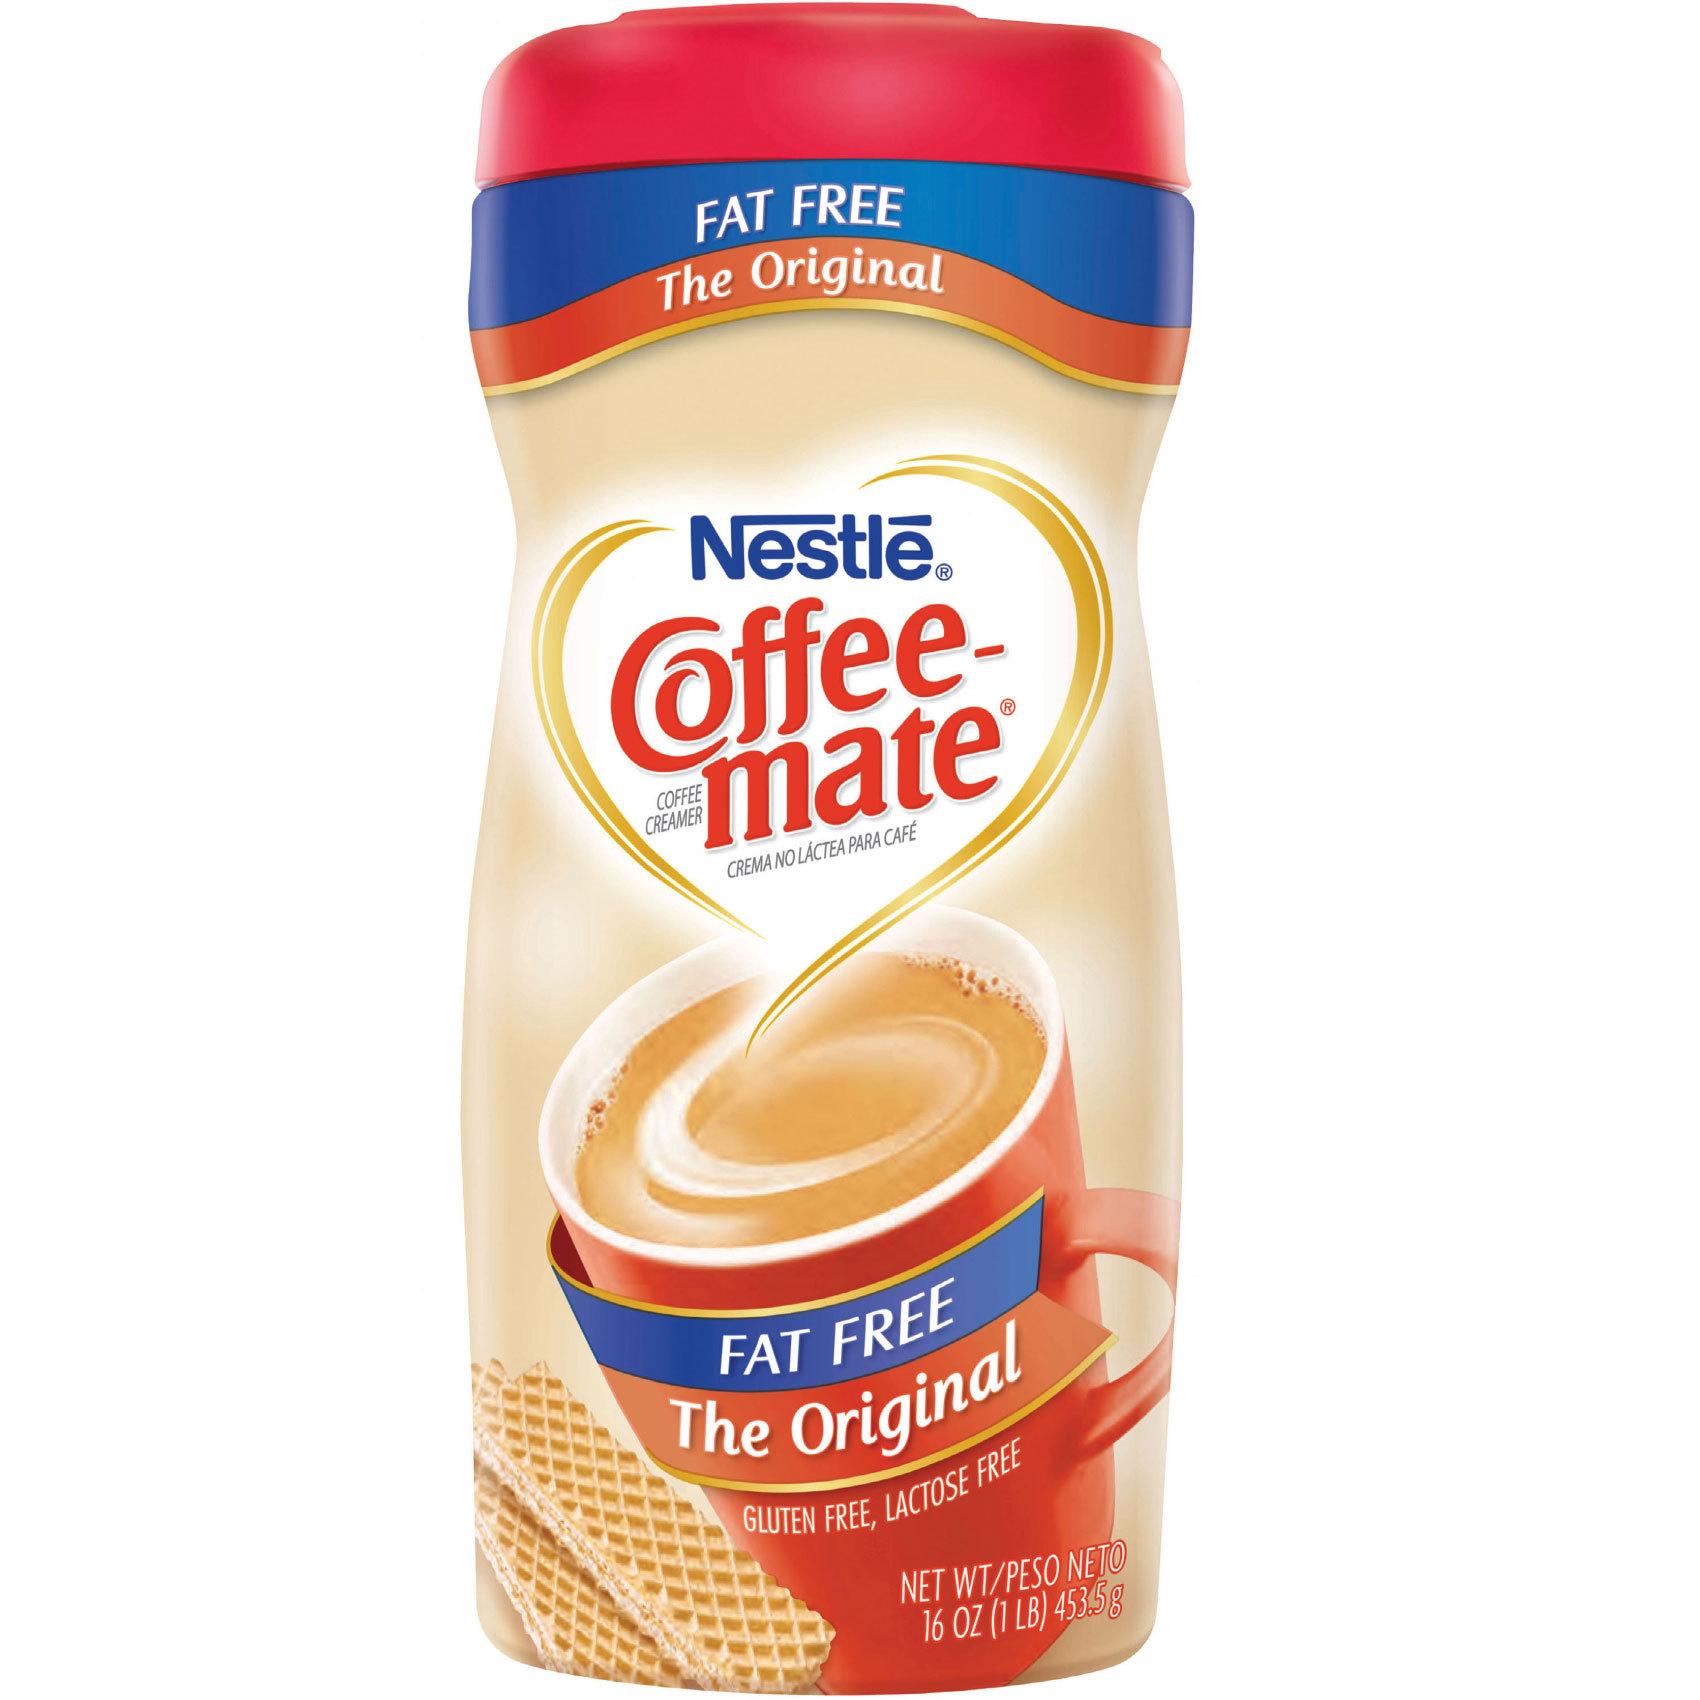 NESTLE COFFEEMATE FAT FREE 453GR